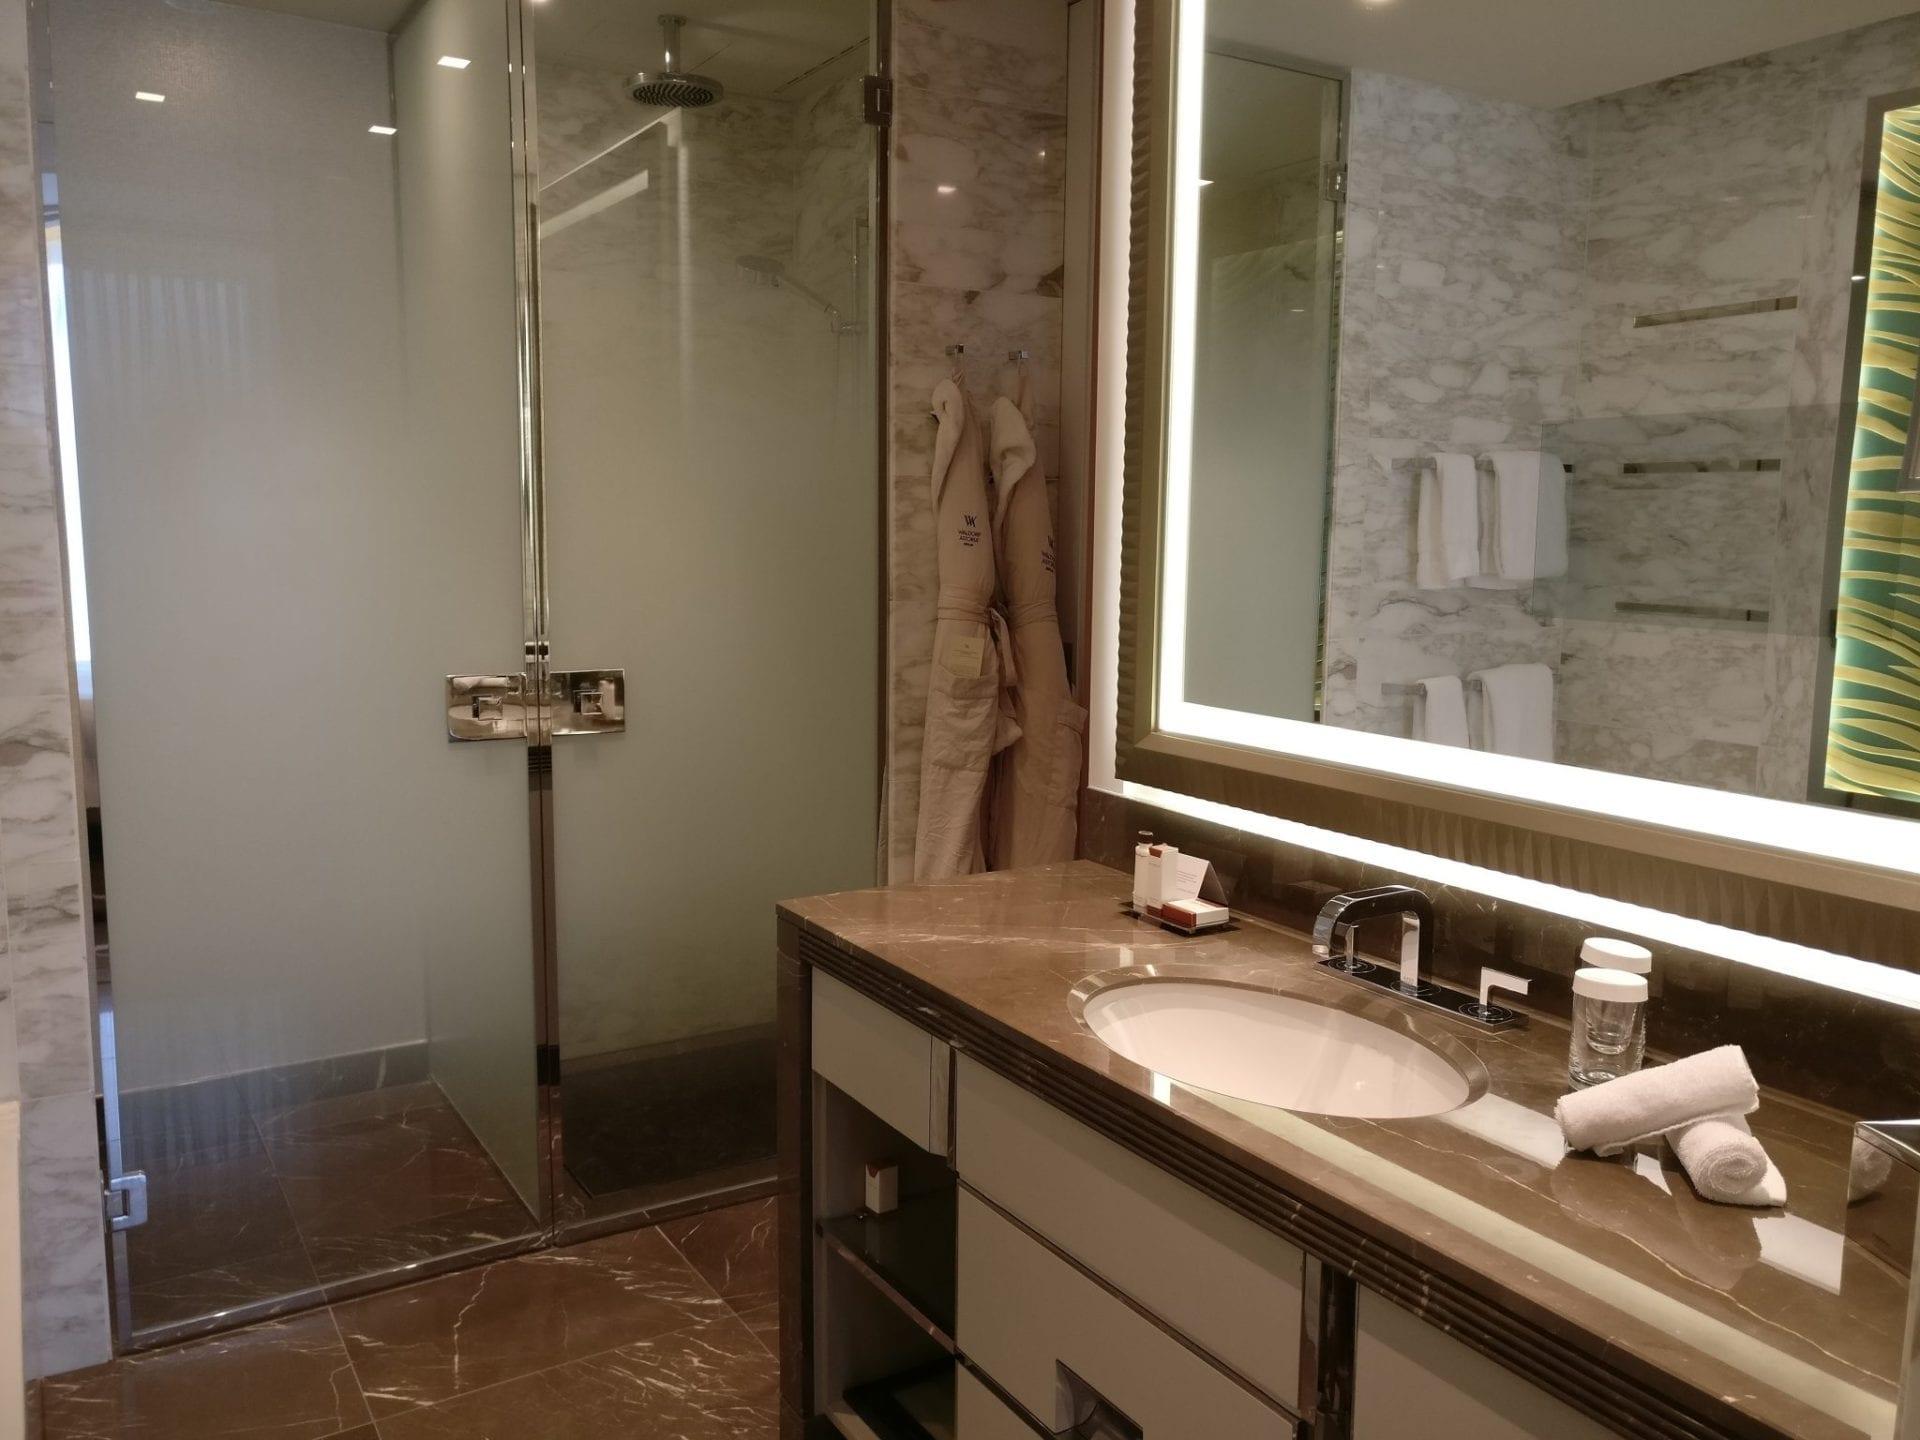 badezimmer berlin bub hotel berlinsued genshagen badezimmer blick ins badezimmer mit hbschen. Black Bedroom Furniture Sets. Home Design Ideas